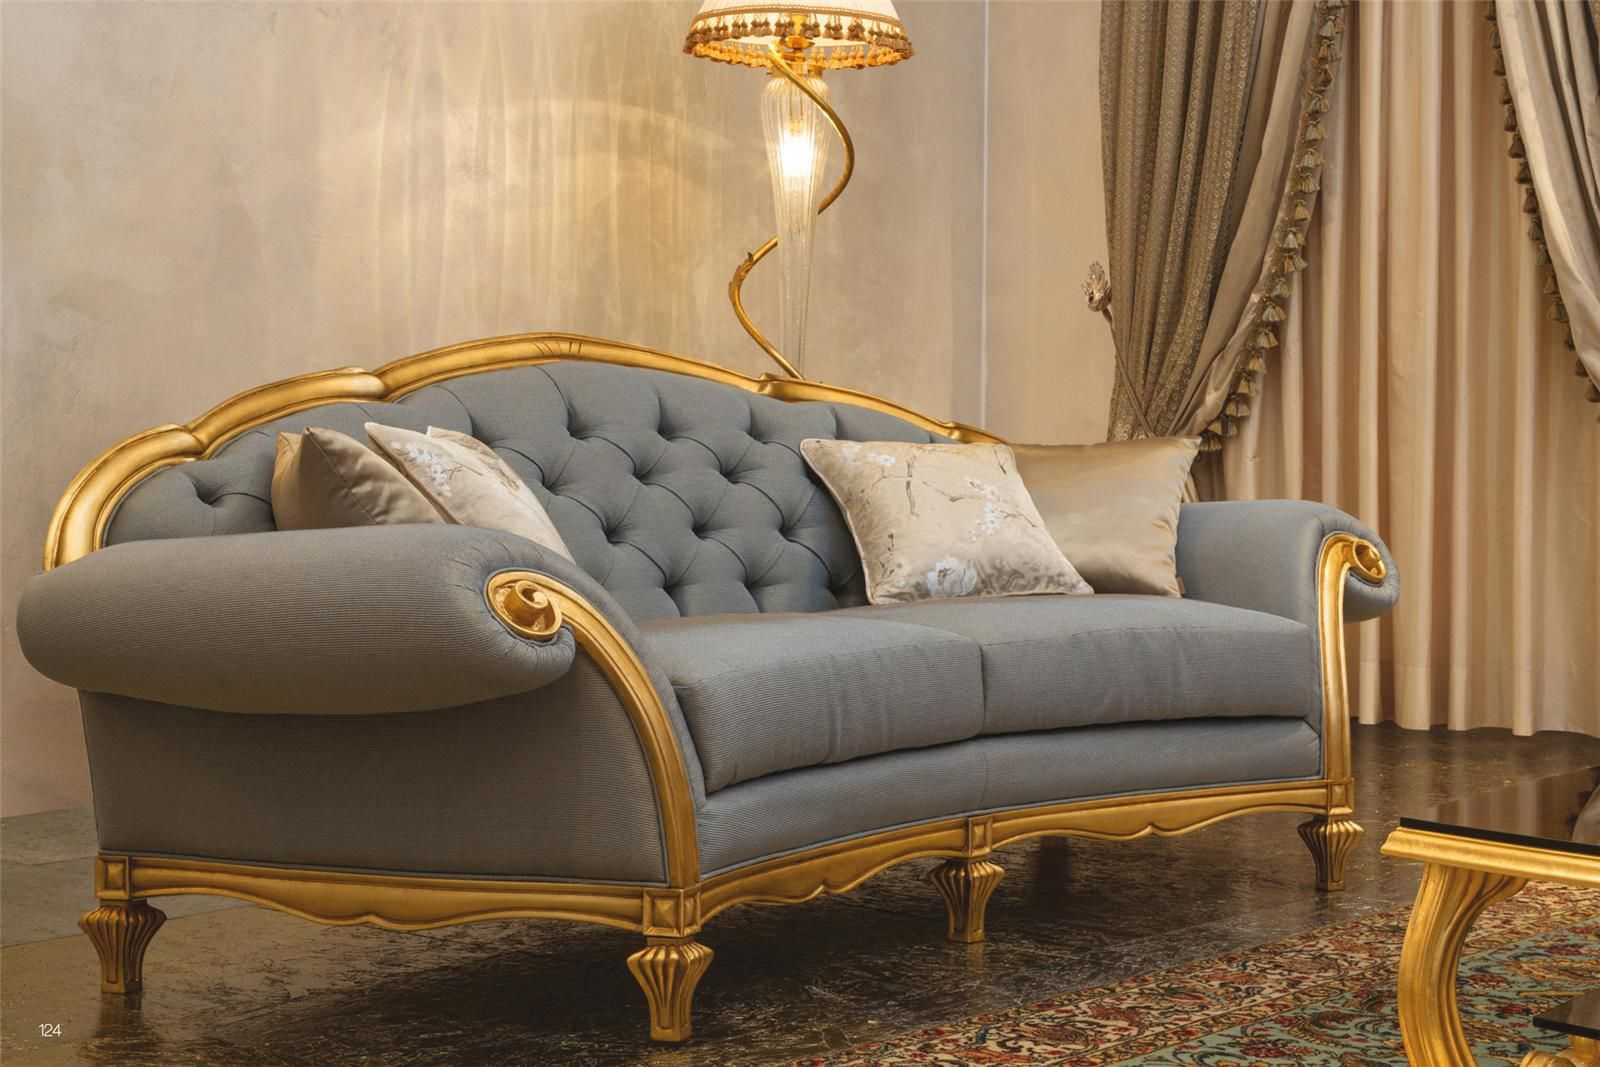 Classic Style Sofa Fabric Upholstery Blossom Mantellassi 1926 Diy Furniture Bedroom Classic Sofa Sofa Design